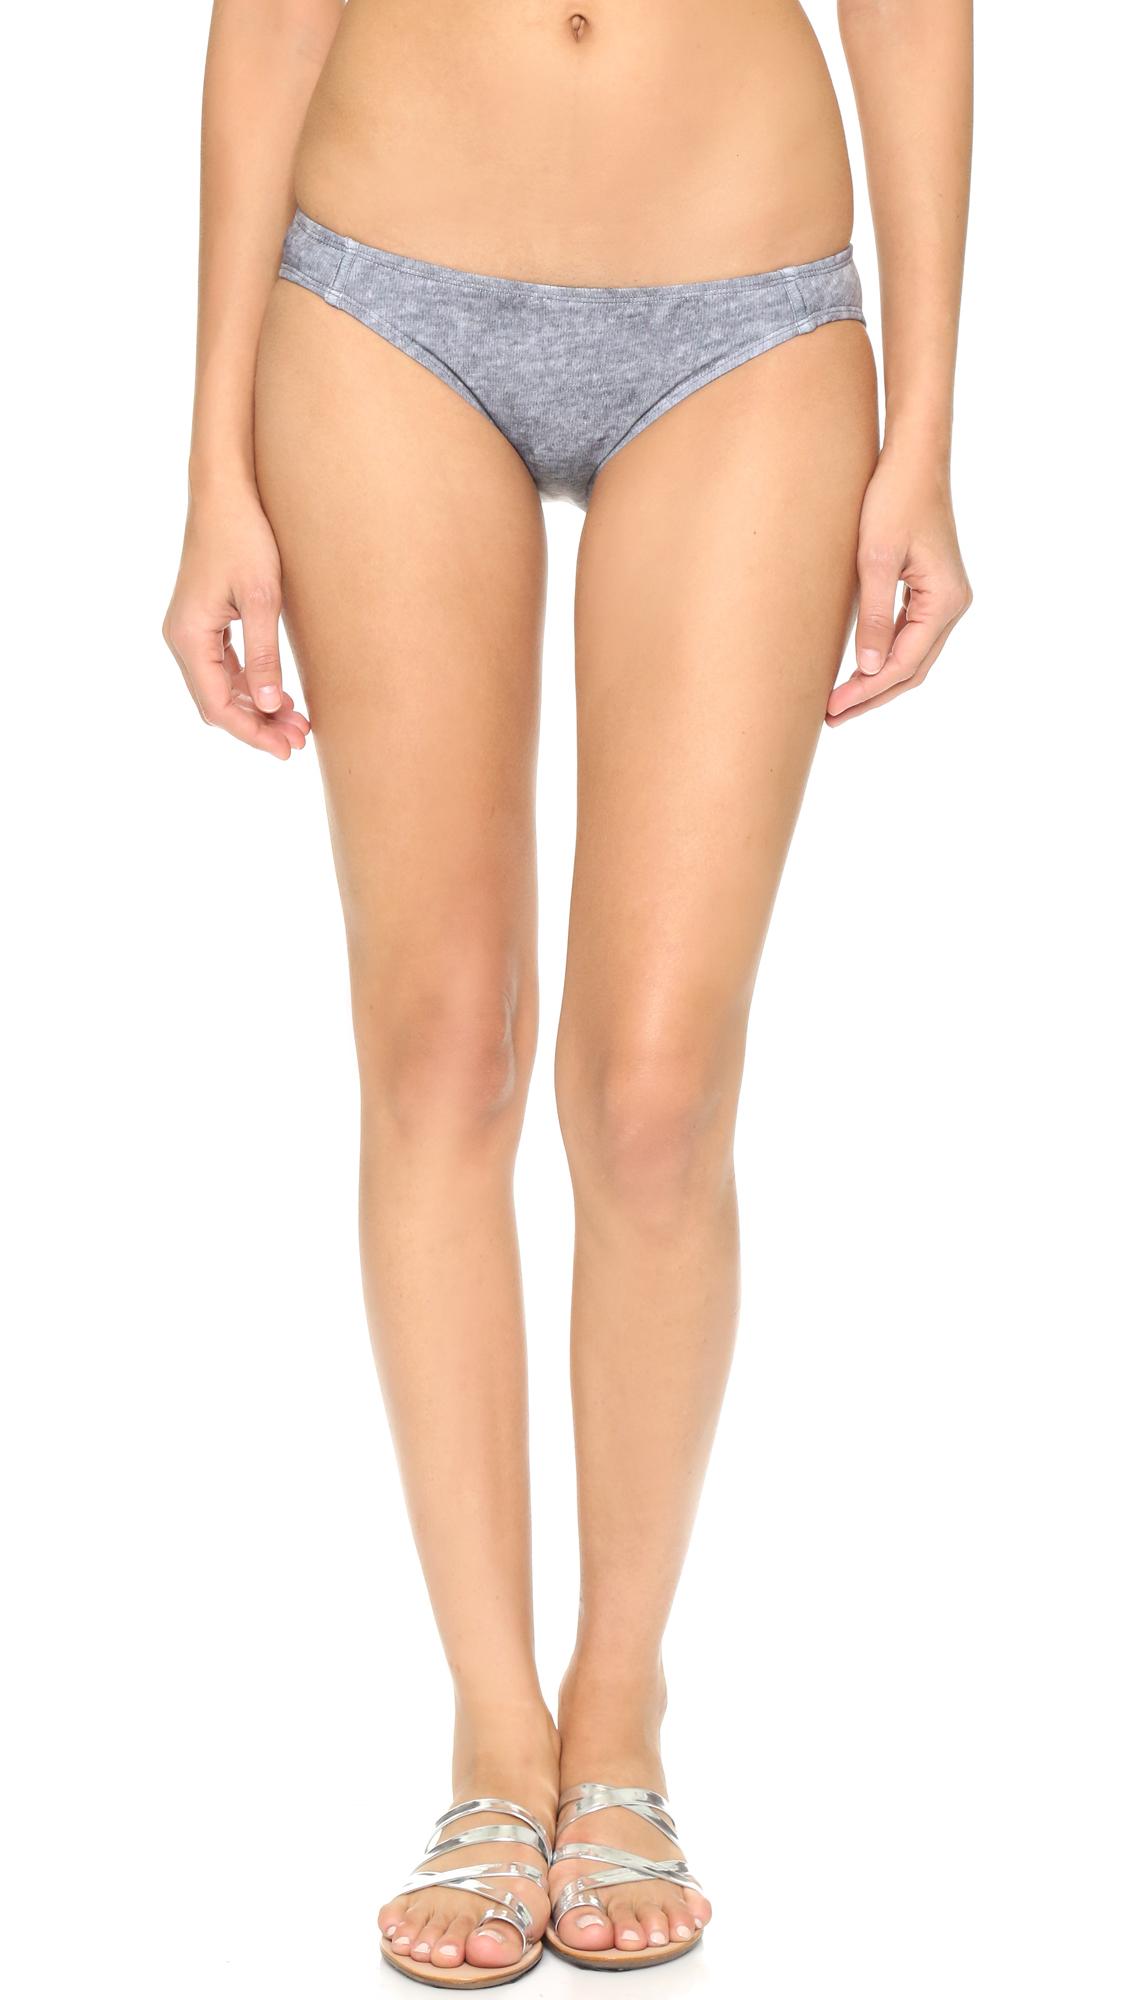 Beth Richards Naomi Bikini Bottoms - Grey Heather